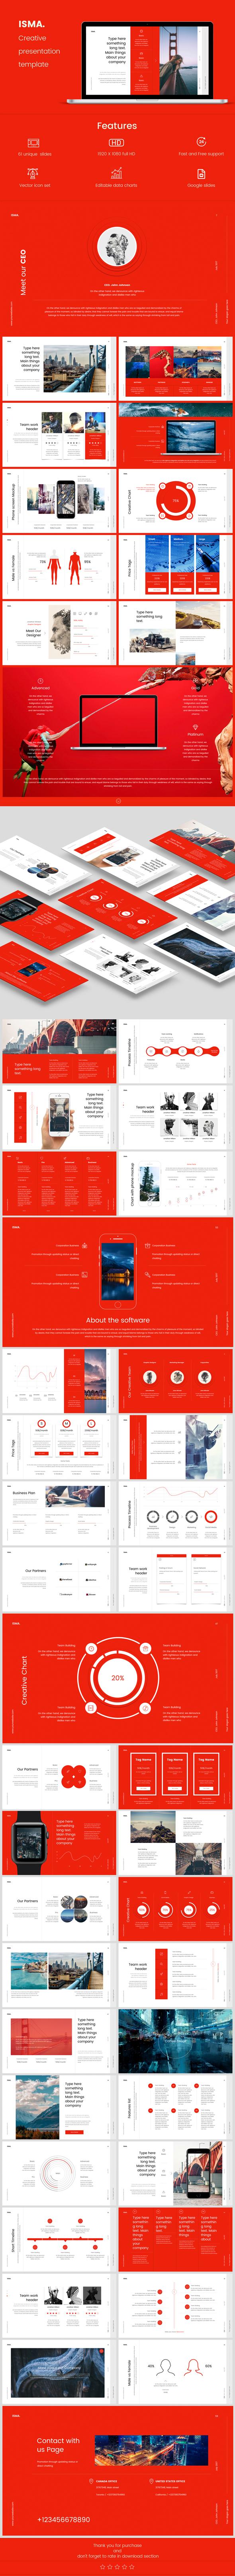 Isma Google Slides Presentation Template - Google Slides Presentation Templates